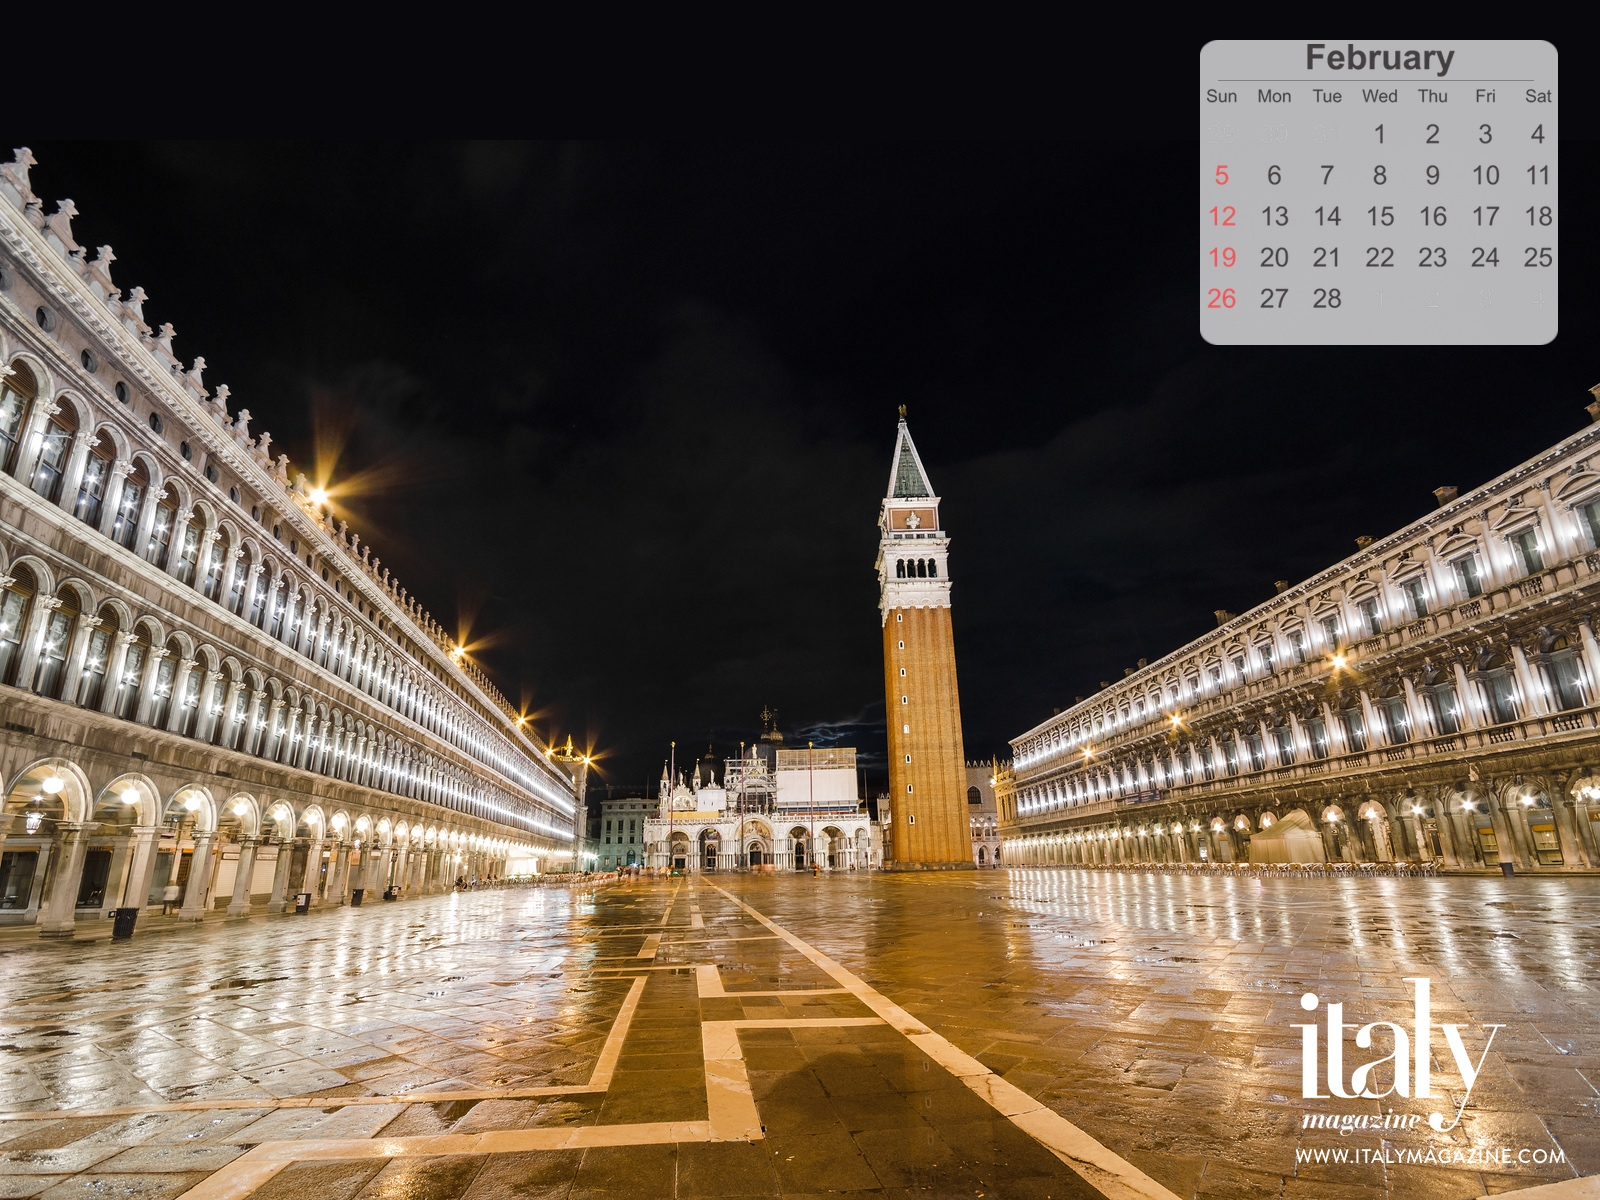 Calendar Clock Wallpaper : Wallpaper calendar february 2017 italy magazine